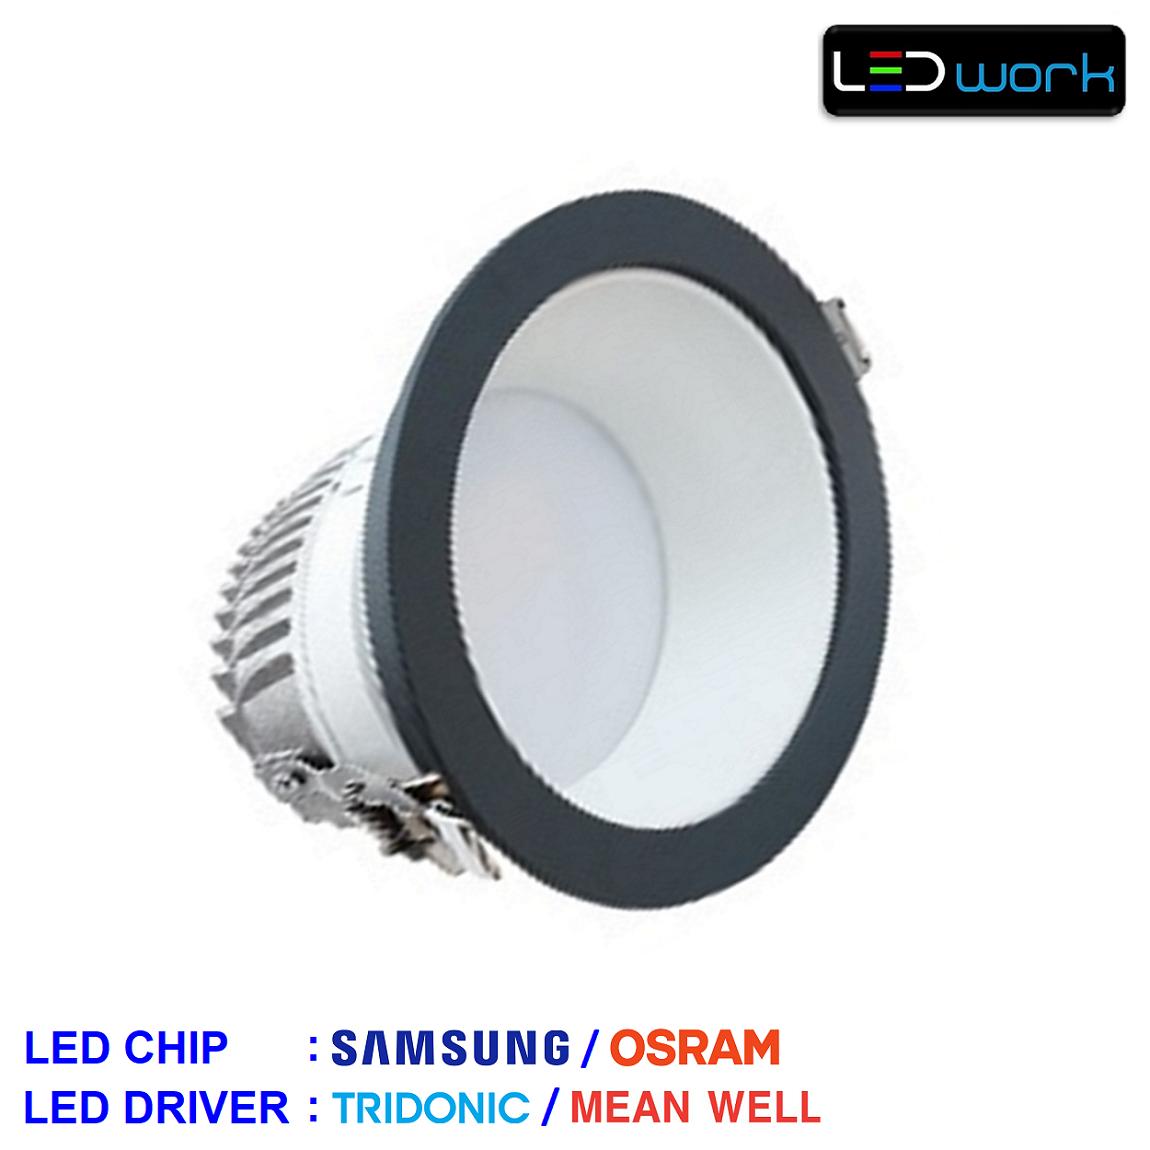 LW-Cosinus-002 - Sıva Altı LED Mağaza Spotu